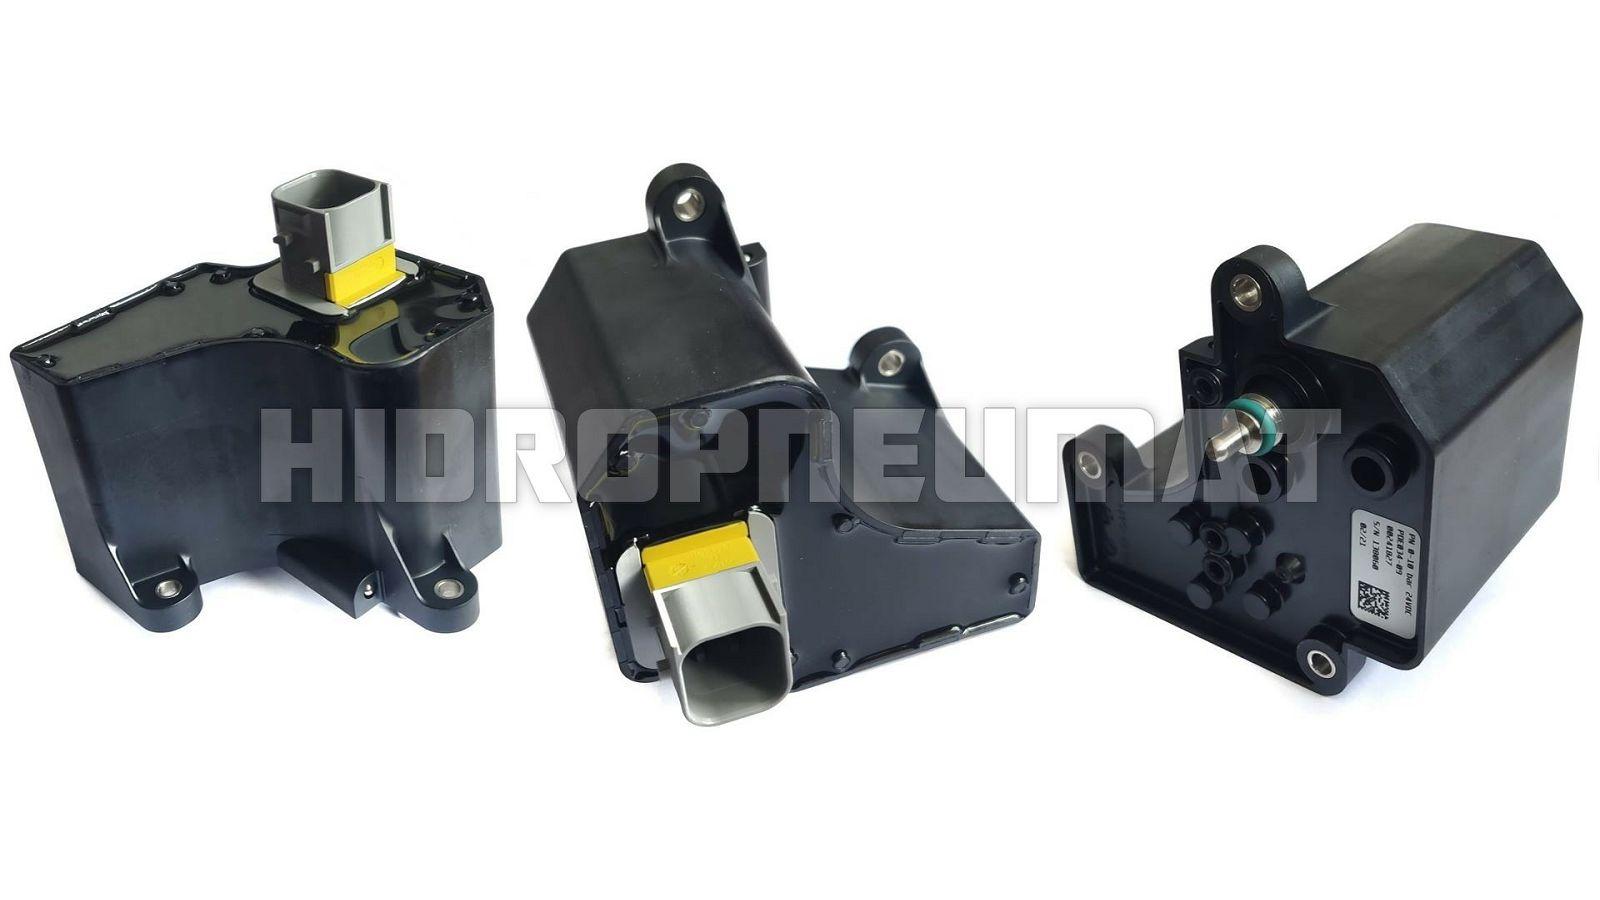 ventil-adblue-pumpe-0-10bar-rvi-euro6-125008_1.jpg